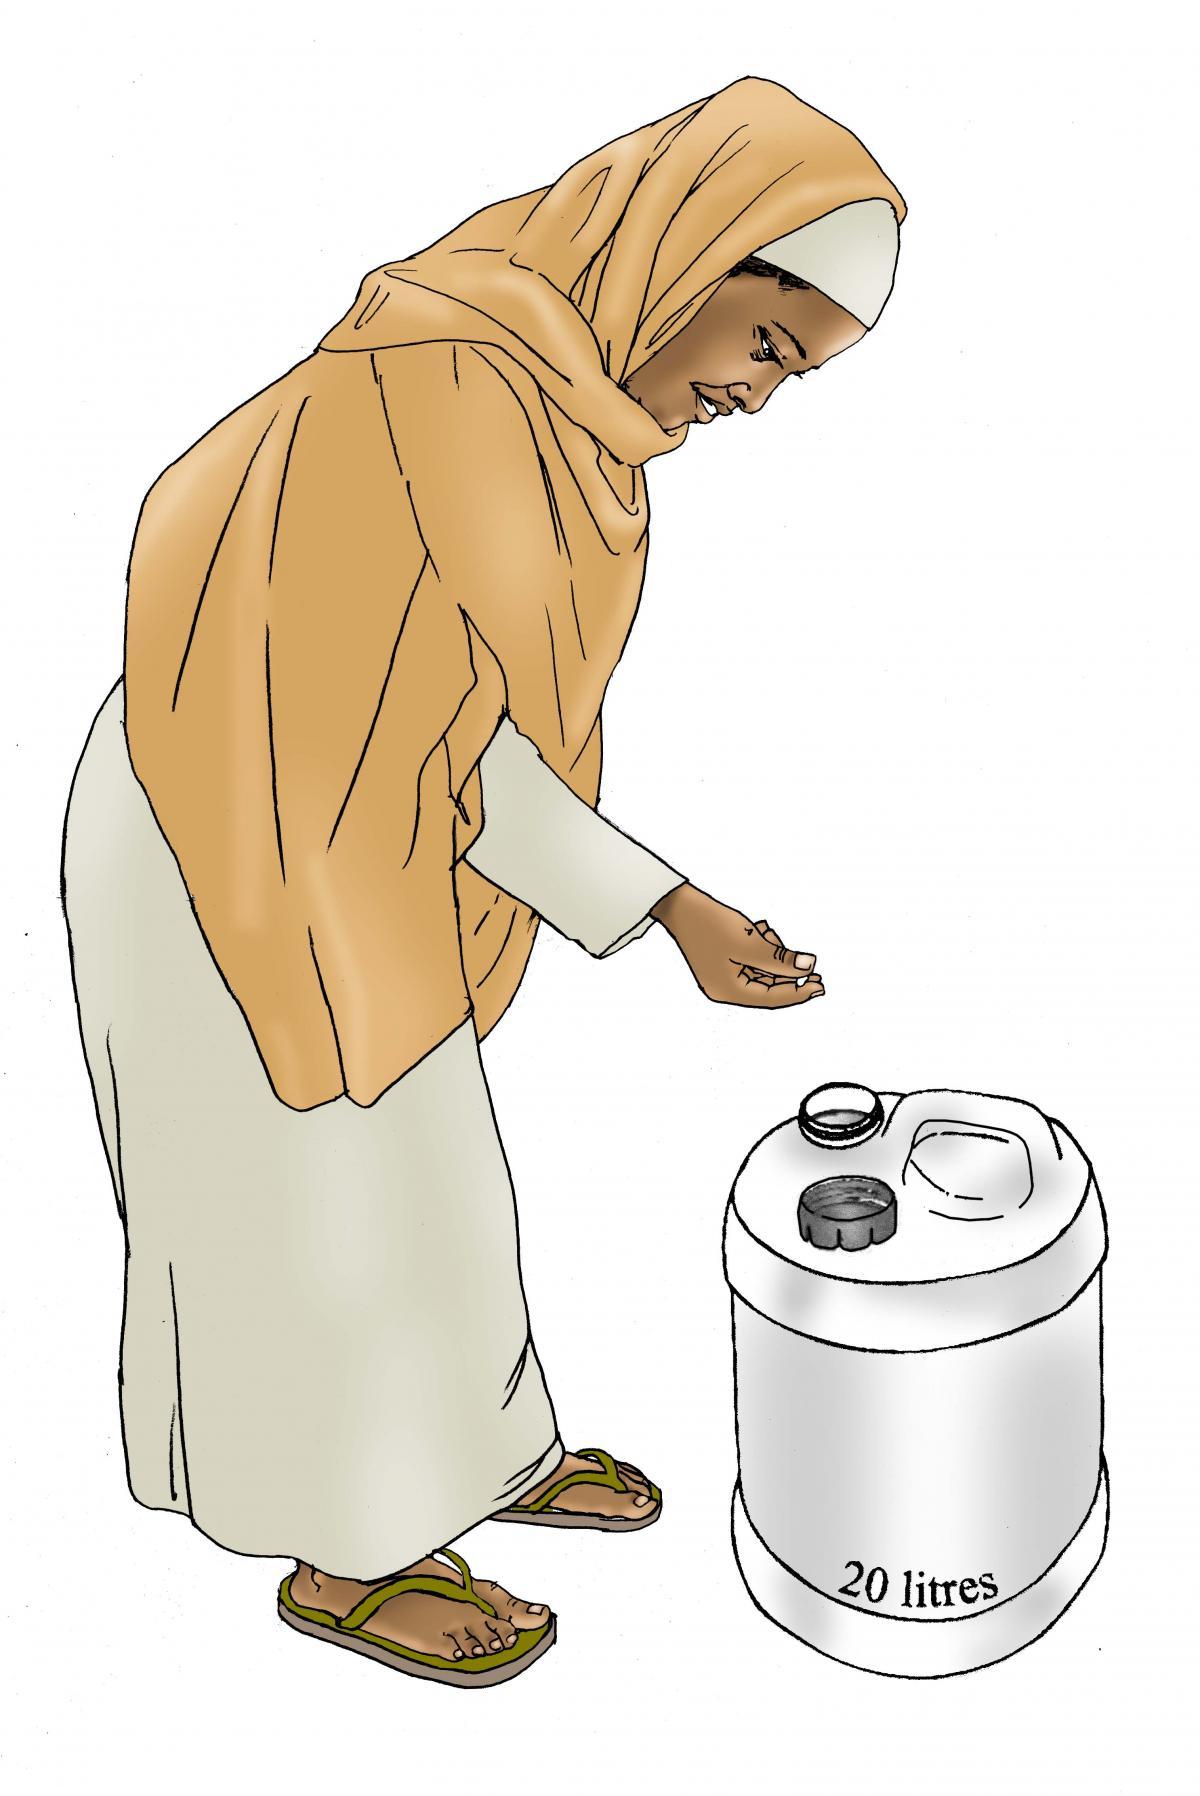 Sanitation - Woman chlorinating water - 05 - Kenya Dadaab